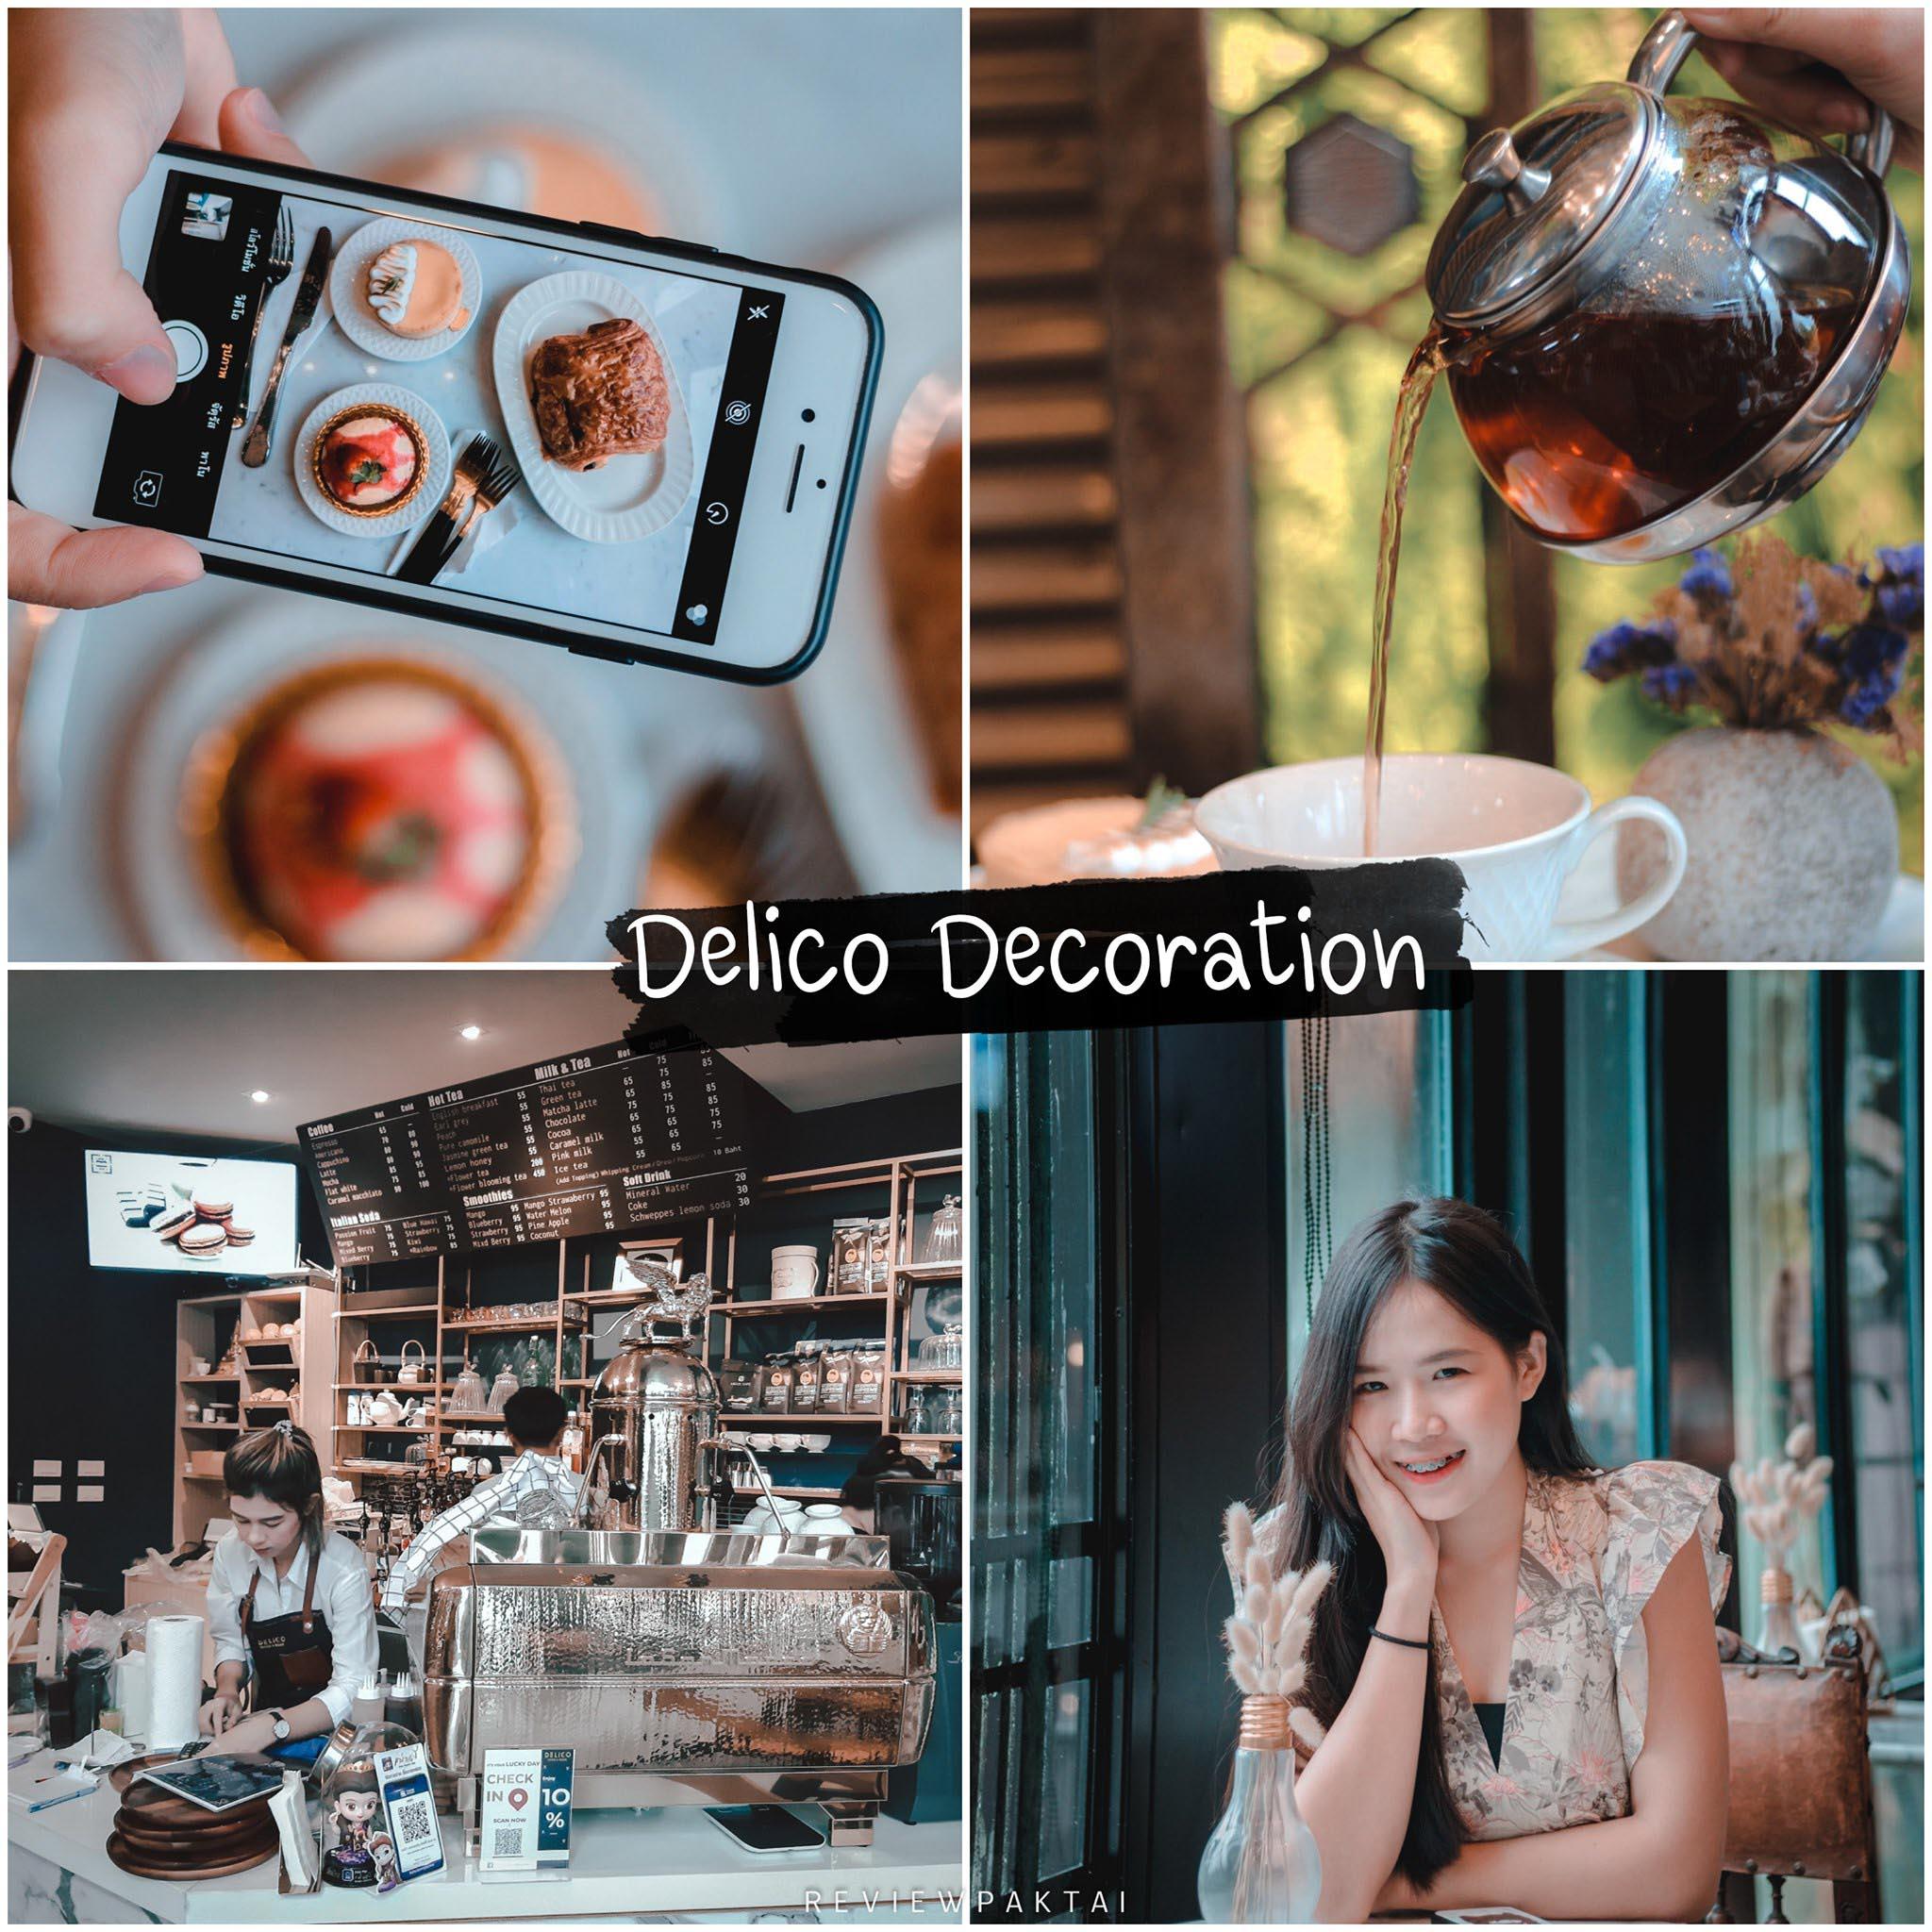 Delico-decoration-coffee-and-dessert ร้านตกแต่งเหมือนอยู่ในยุโรปมีที่จอดรถเยอะ-กาแฟดี-หอม-เข้ม-ถุกจริตมาก-ราคาก็สมเหตุสมผล-ส่วนตัวว่าไม่แพงเท่าไหร่-ร้านตกแต่งดีมีสไตล์-มีมุมถ่ายรุปเยอะมาก-มีครบทั้งอาหาร-ขนม-เบเกอรี่-กาแฟ- ภูเก็ต,คาเฟ่,ที่เที่ยว,ร้านกาแฟ,เด็ด,อร่อย,ต้องลอง